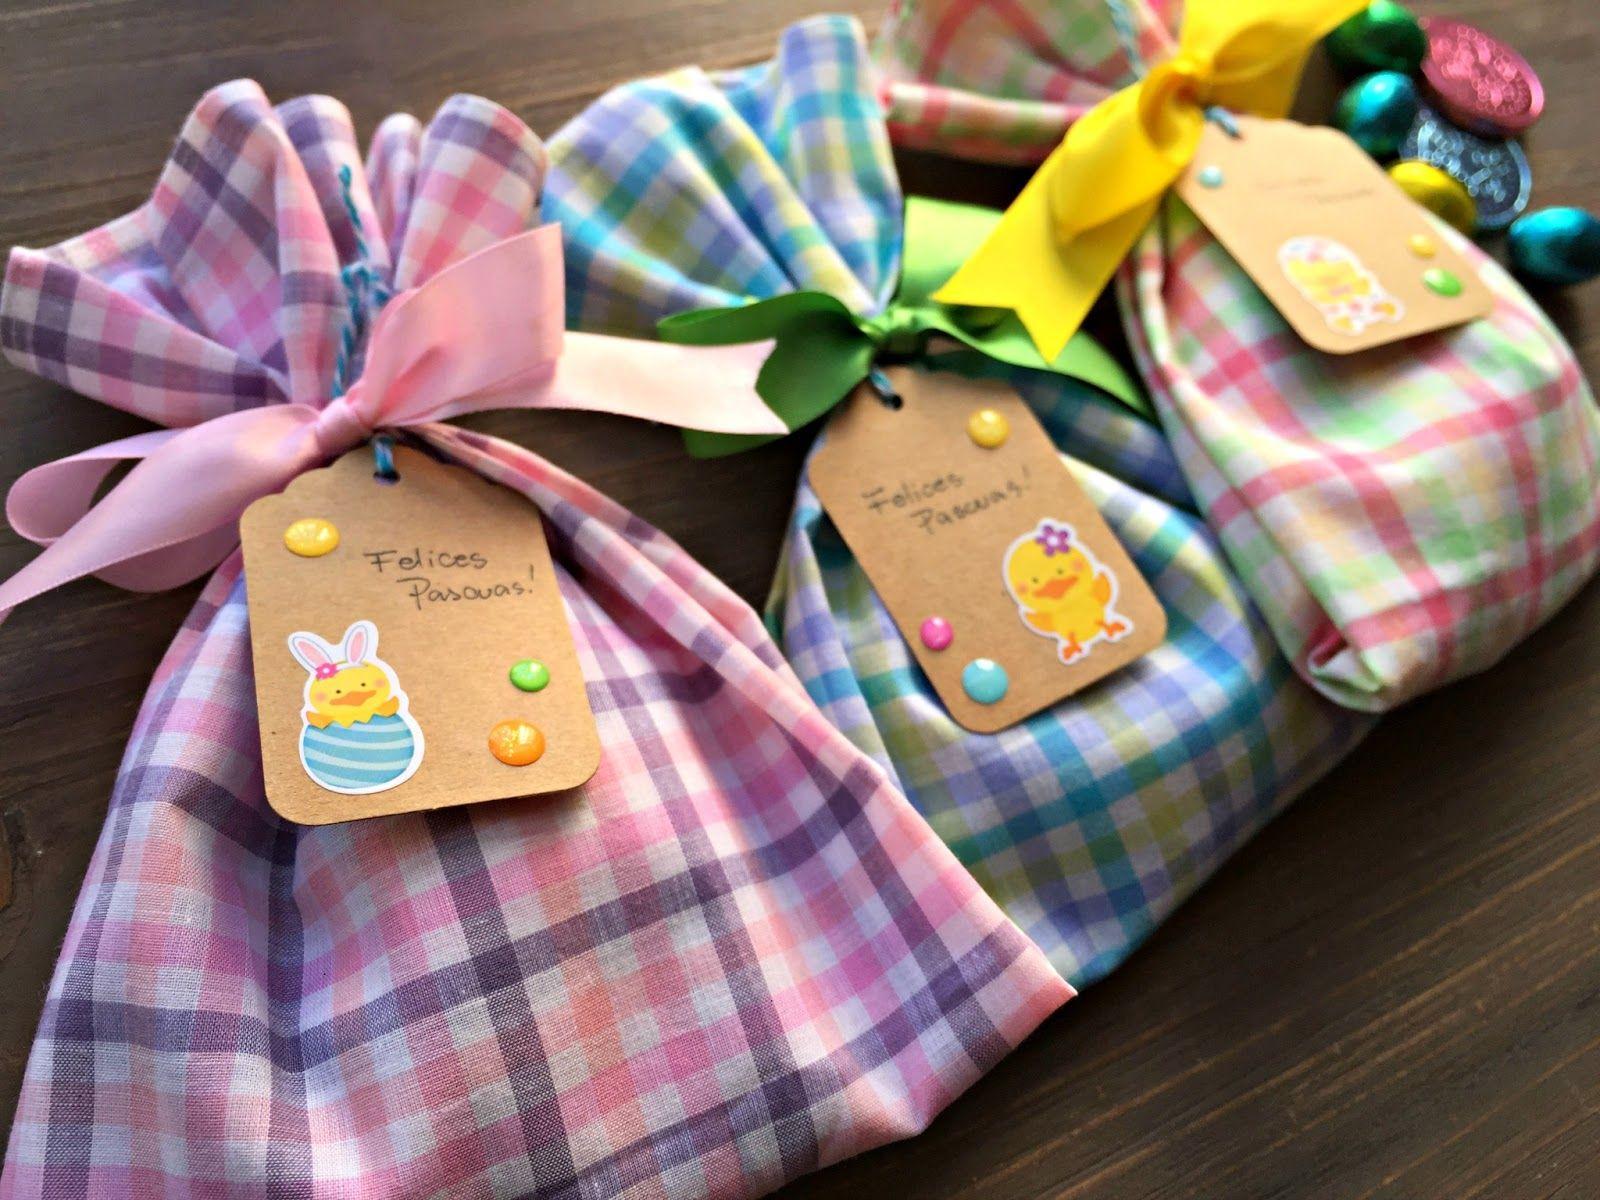 7c5e6f23f Cómo hacer bolsitas de tela sin coser | bolsitas navideñas | Fabric ...